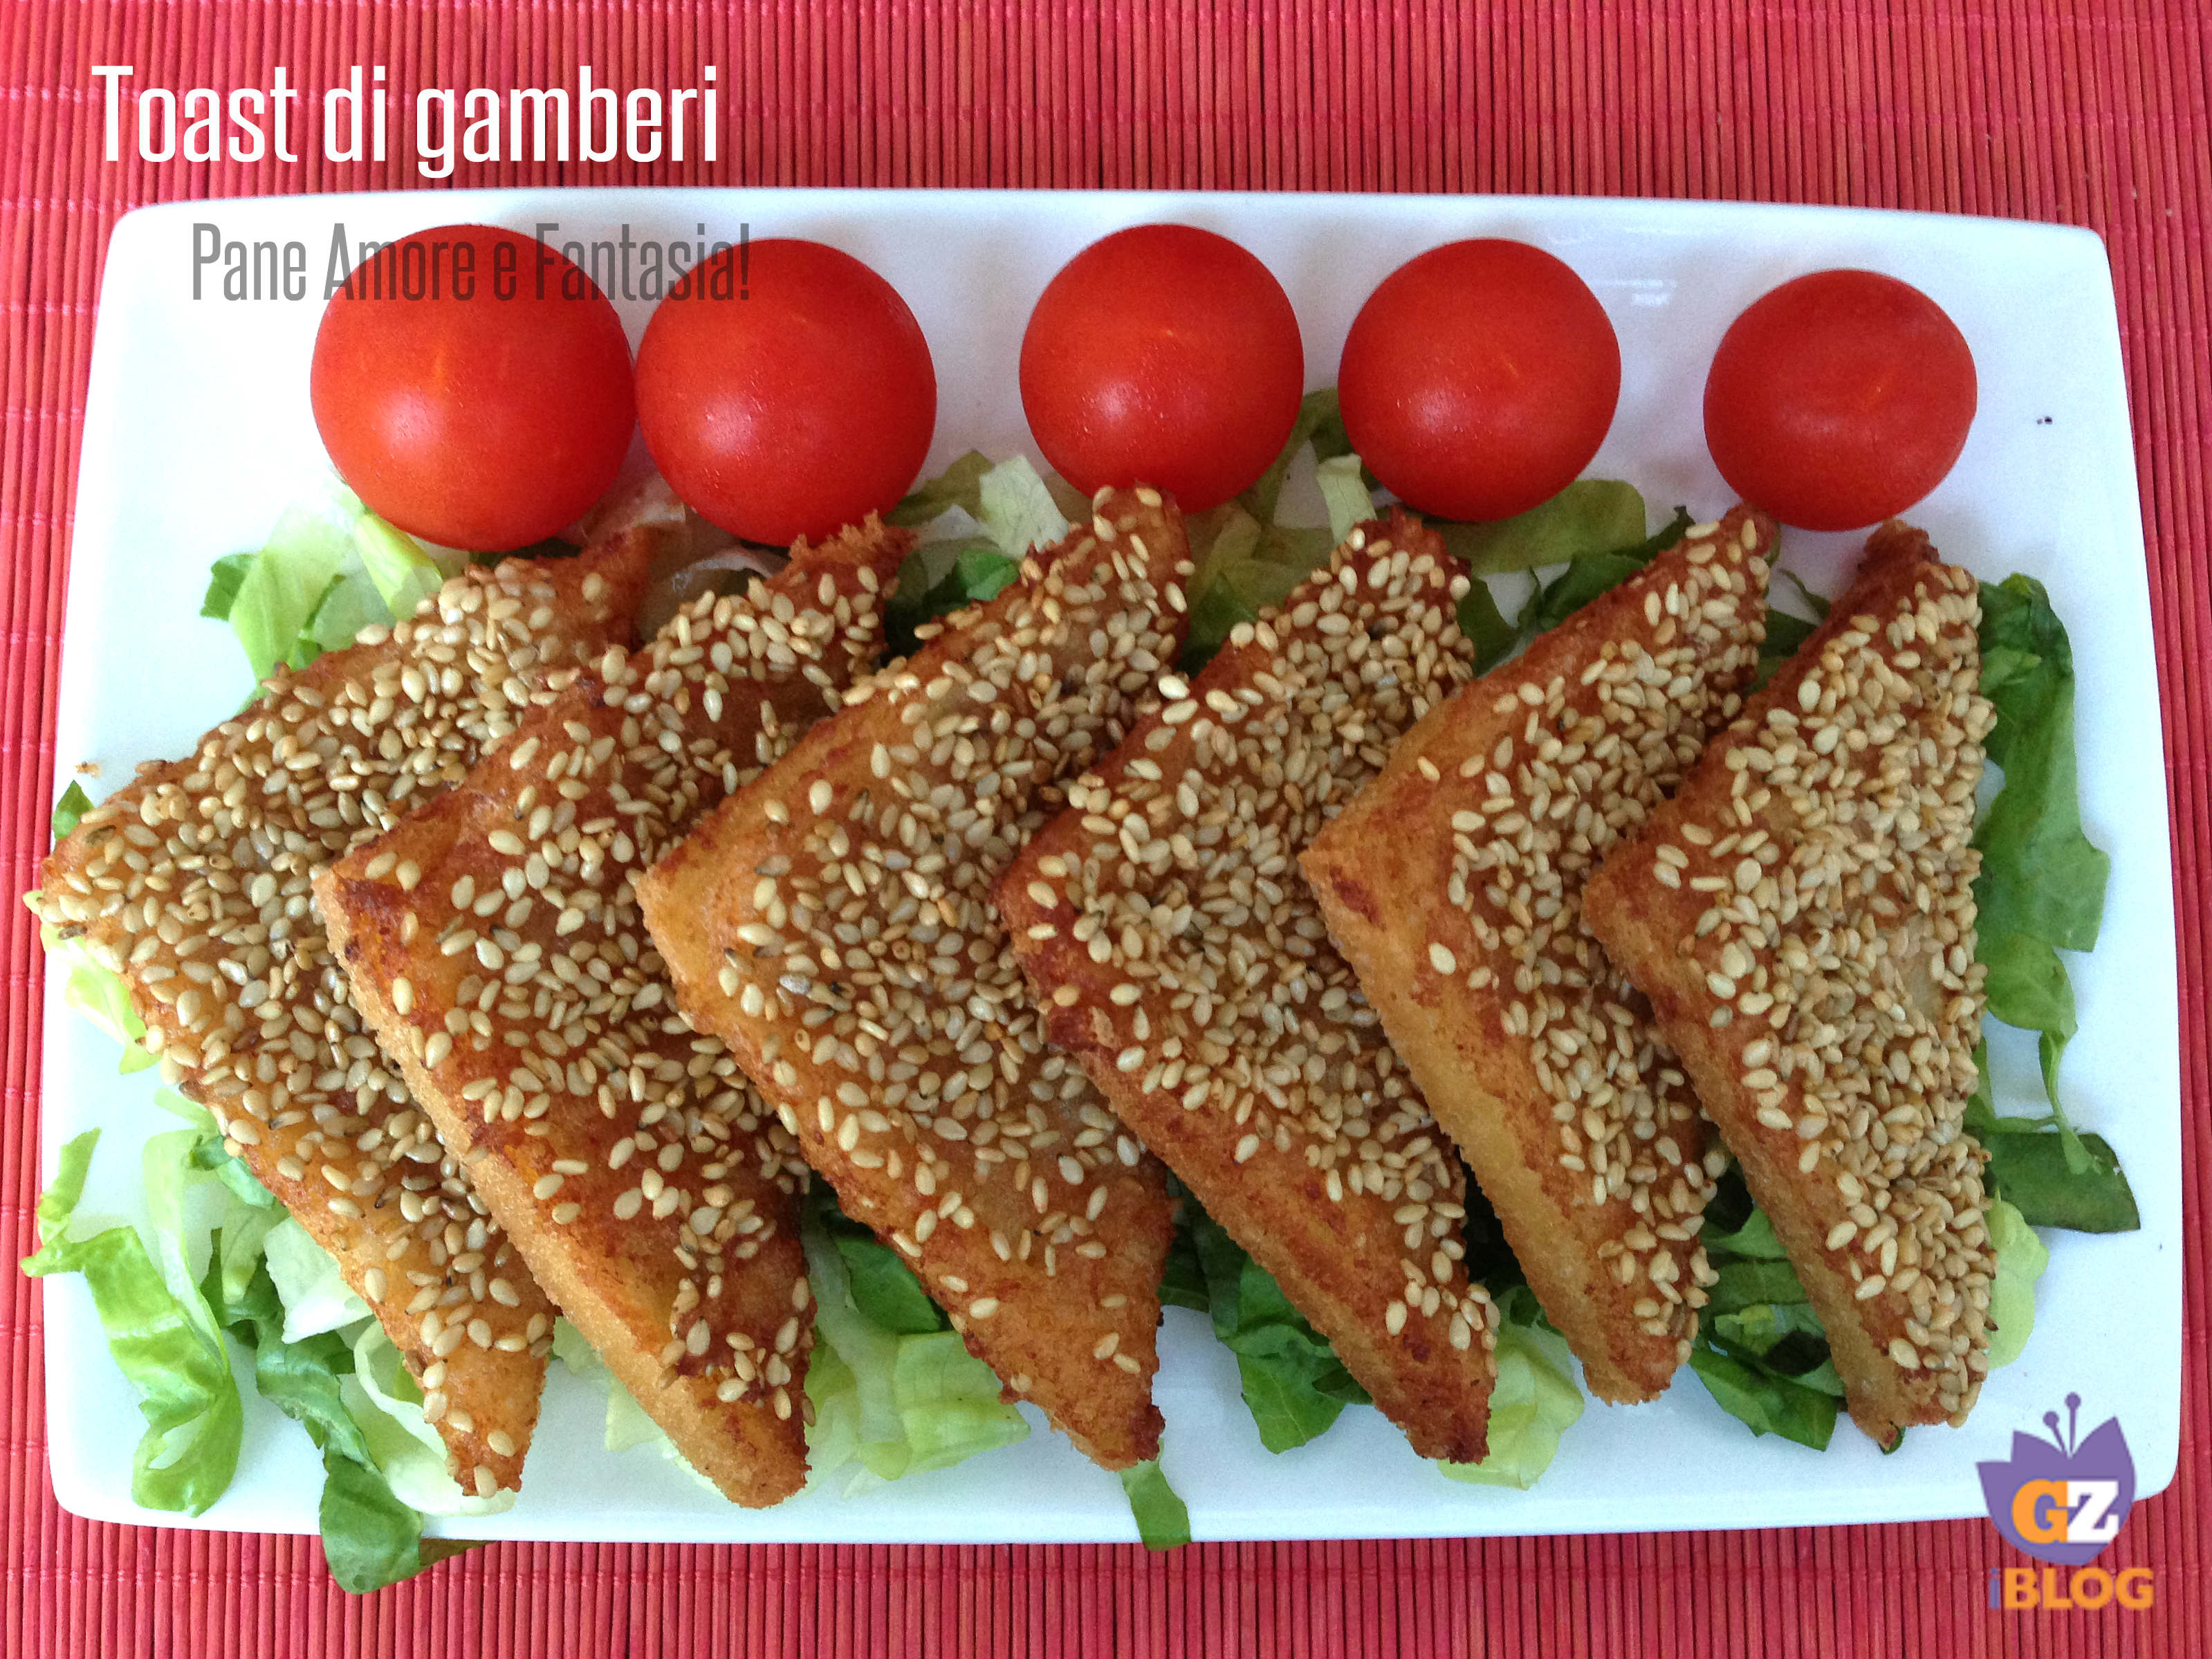 Toast di gamberi cinesi ricetta pane amore e fantasia for Gamberi alla piastra cinesi